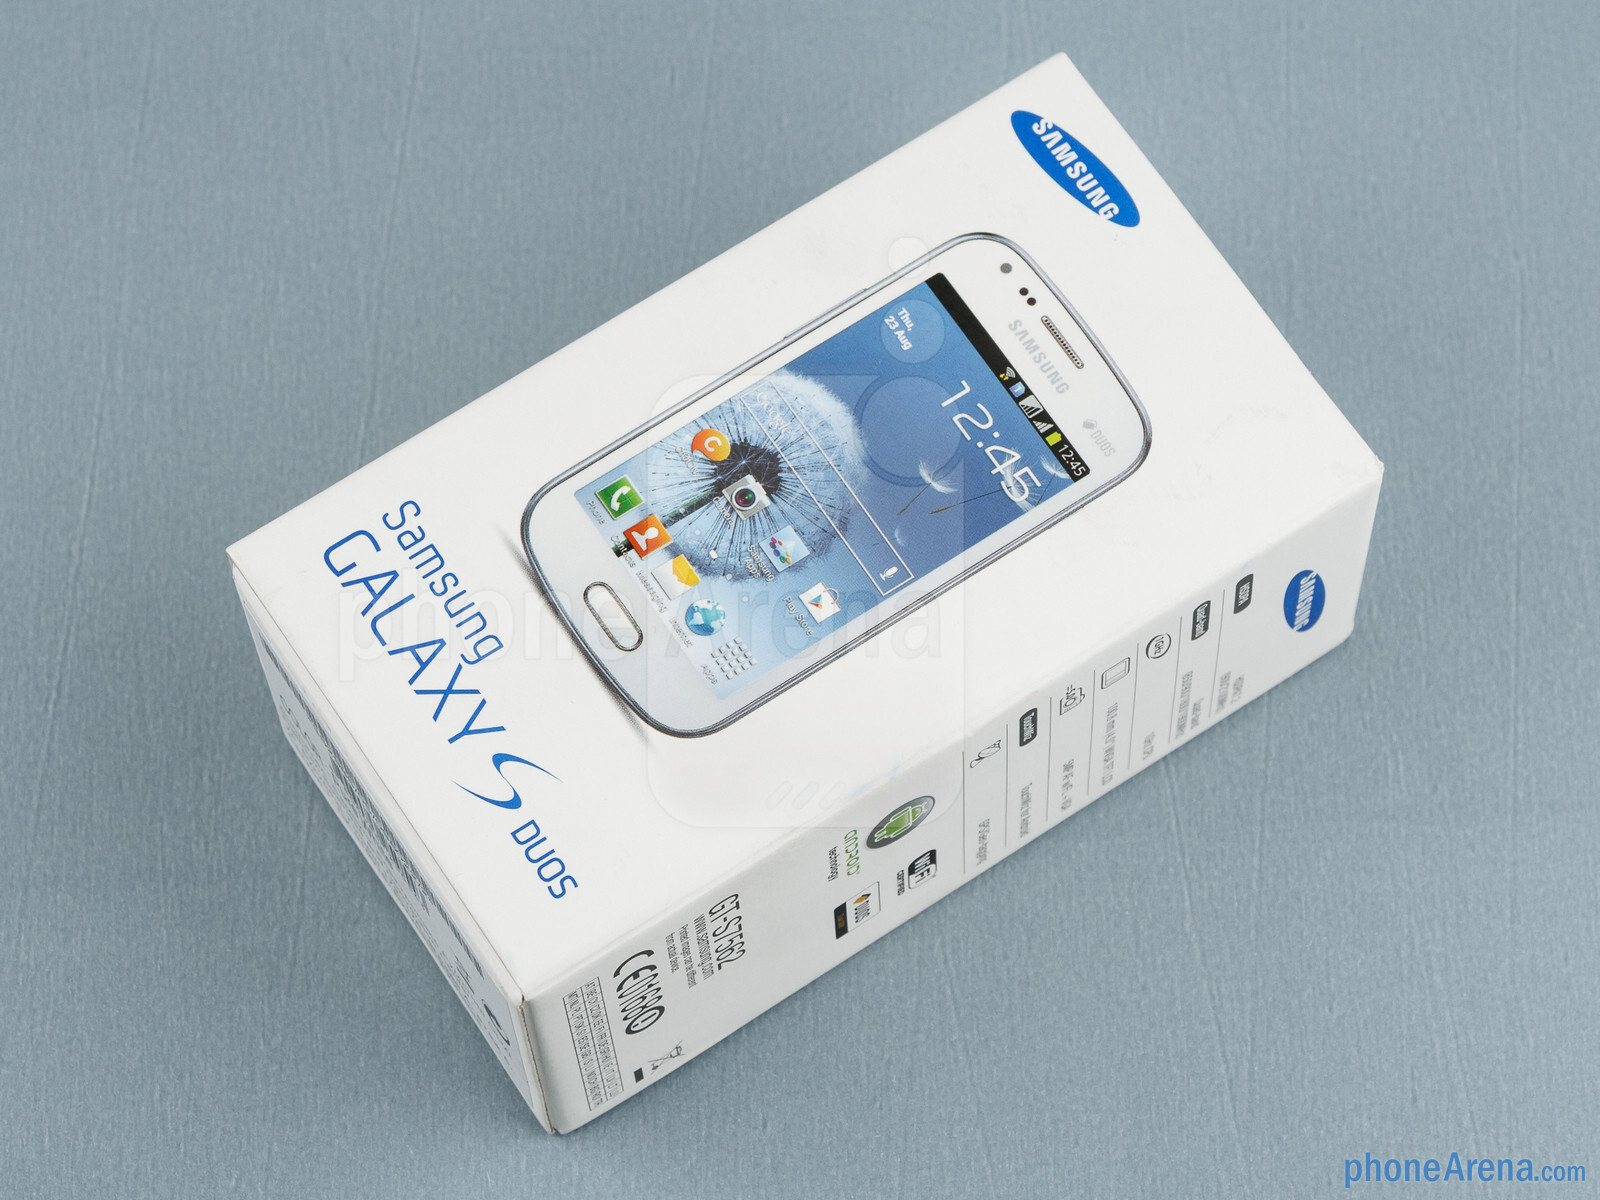 Samsung galaxy s duos s7562 full phone specifications - Samsung Galaxy S Duos S7562 Full Phone Specifications 26